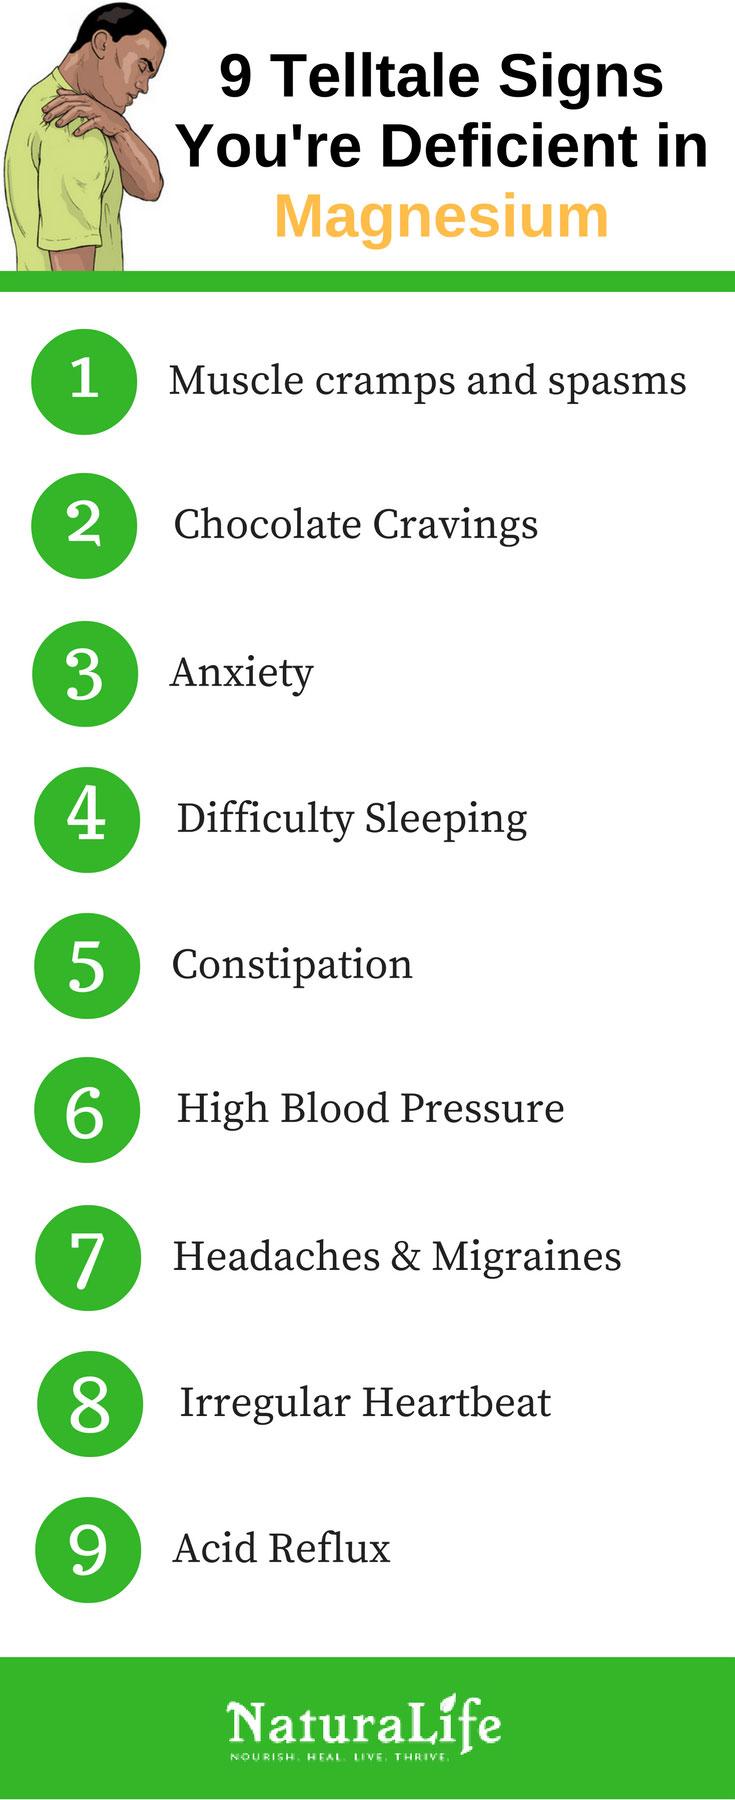 9 symptoms of a magnesium deficiency